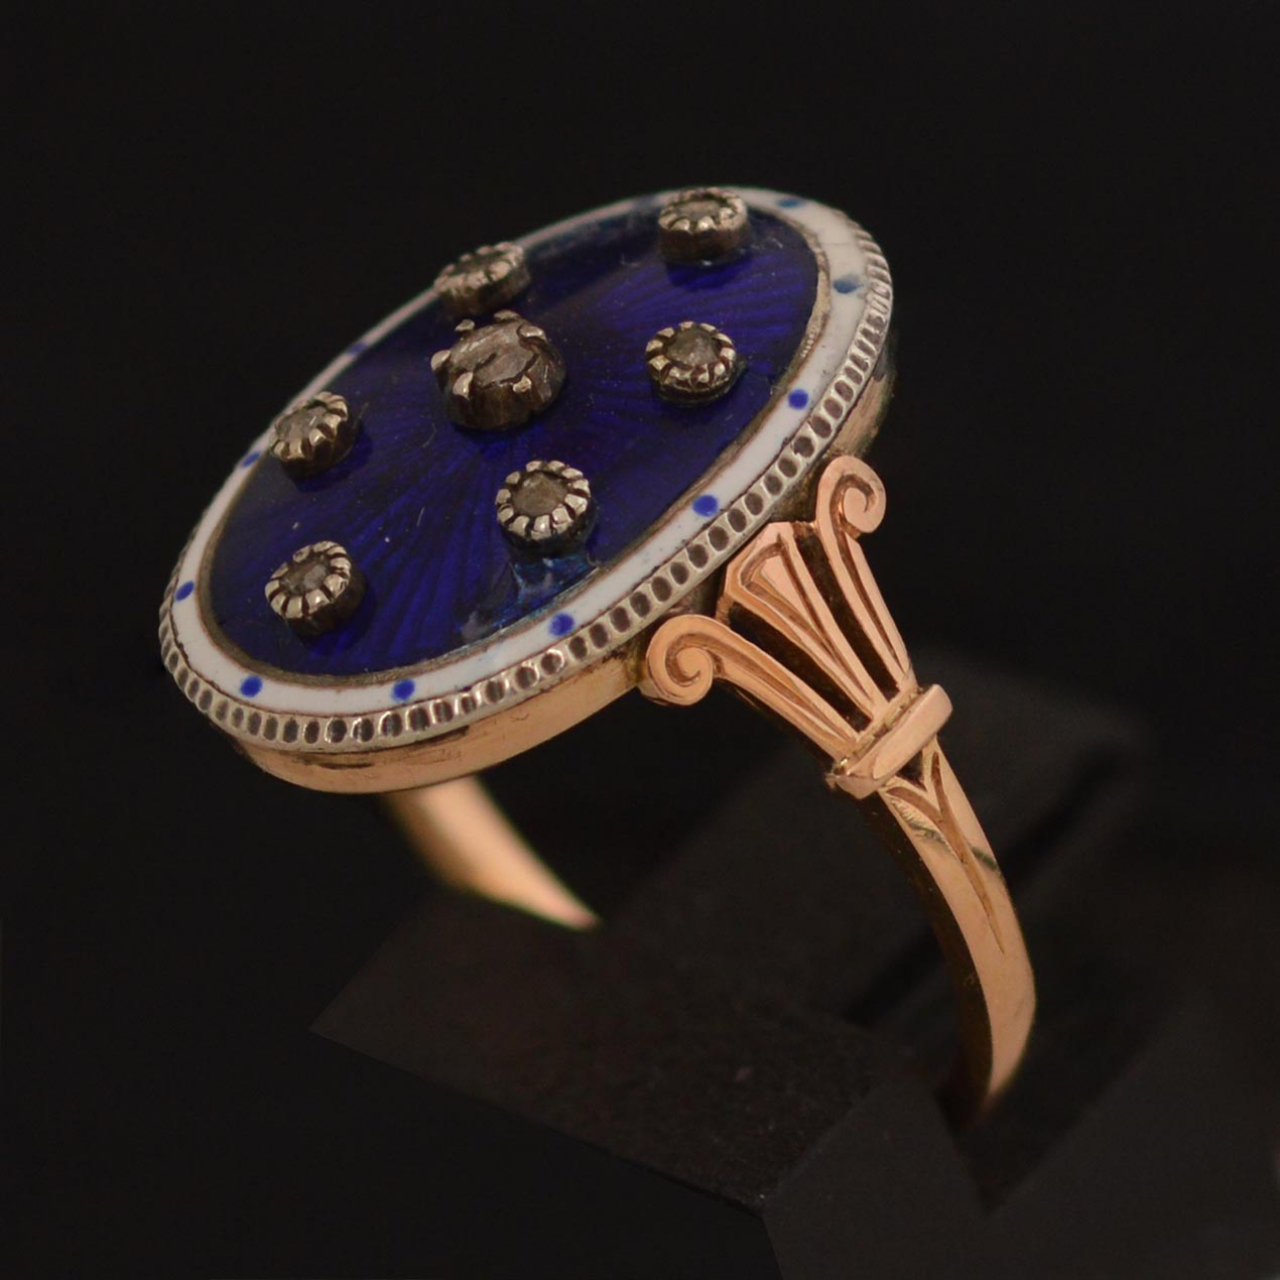 19th-century-18k-gold-blue-enamel-etoile-ring